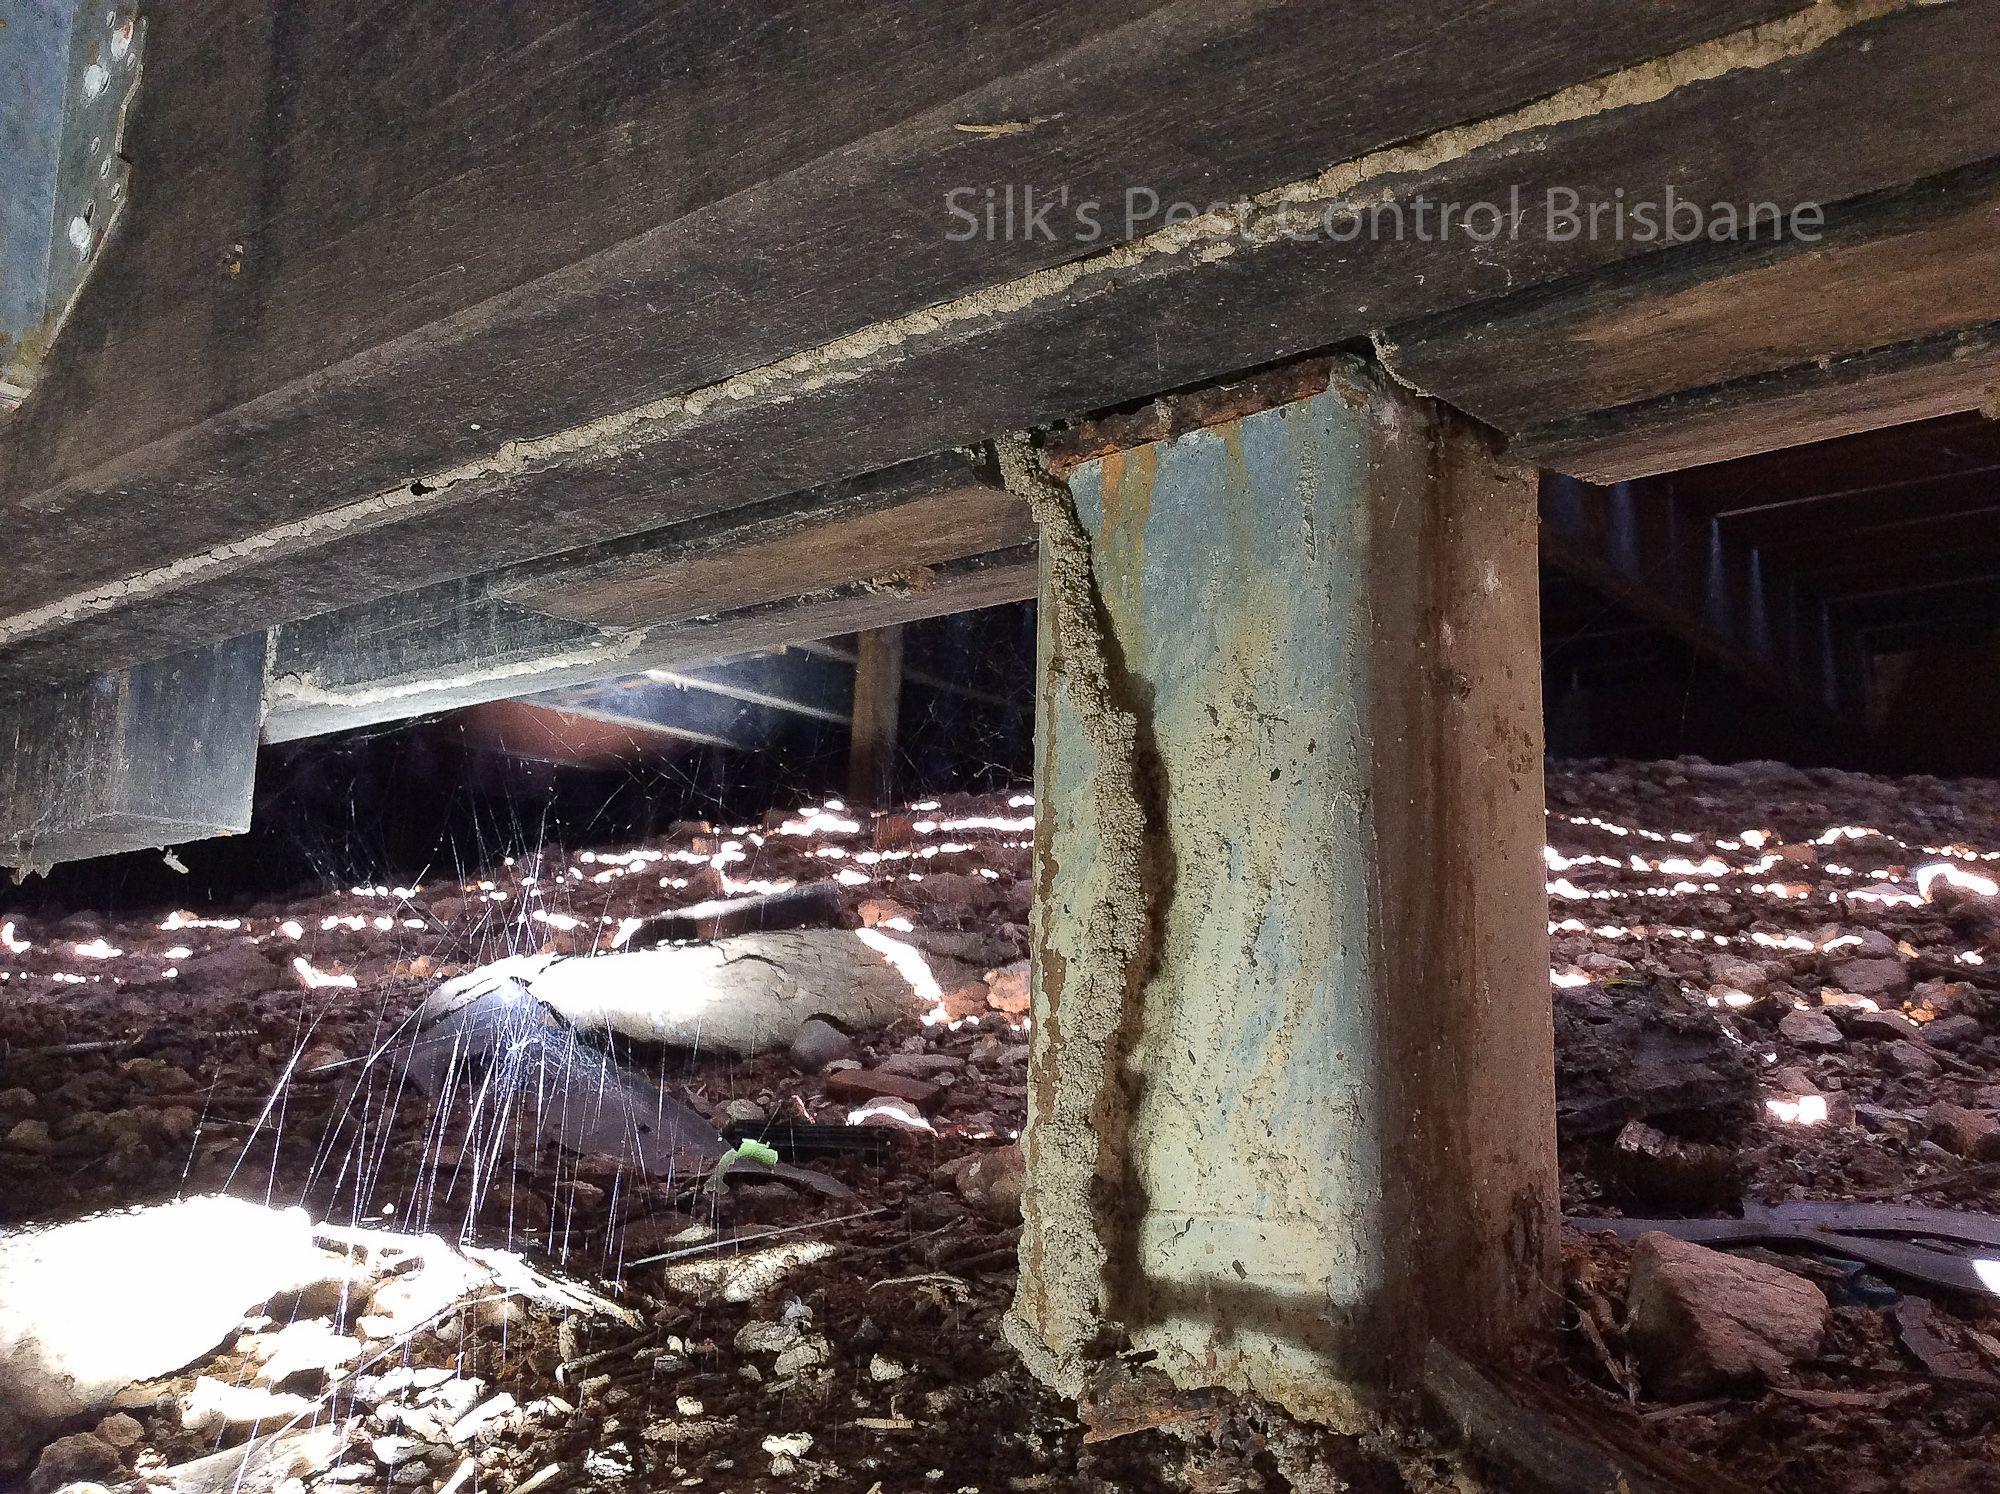 Silk S Pest Control Warner Termite Pest Control Experts Termite Inspection Pest Inspection Pest Control